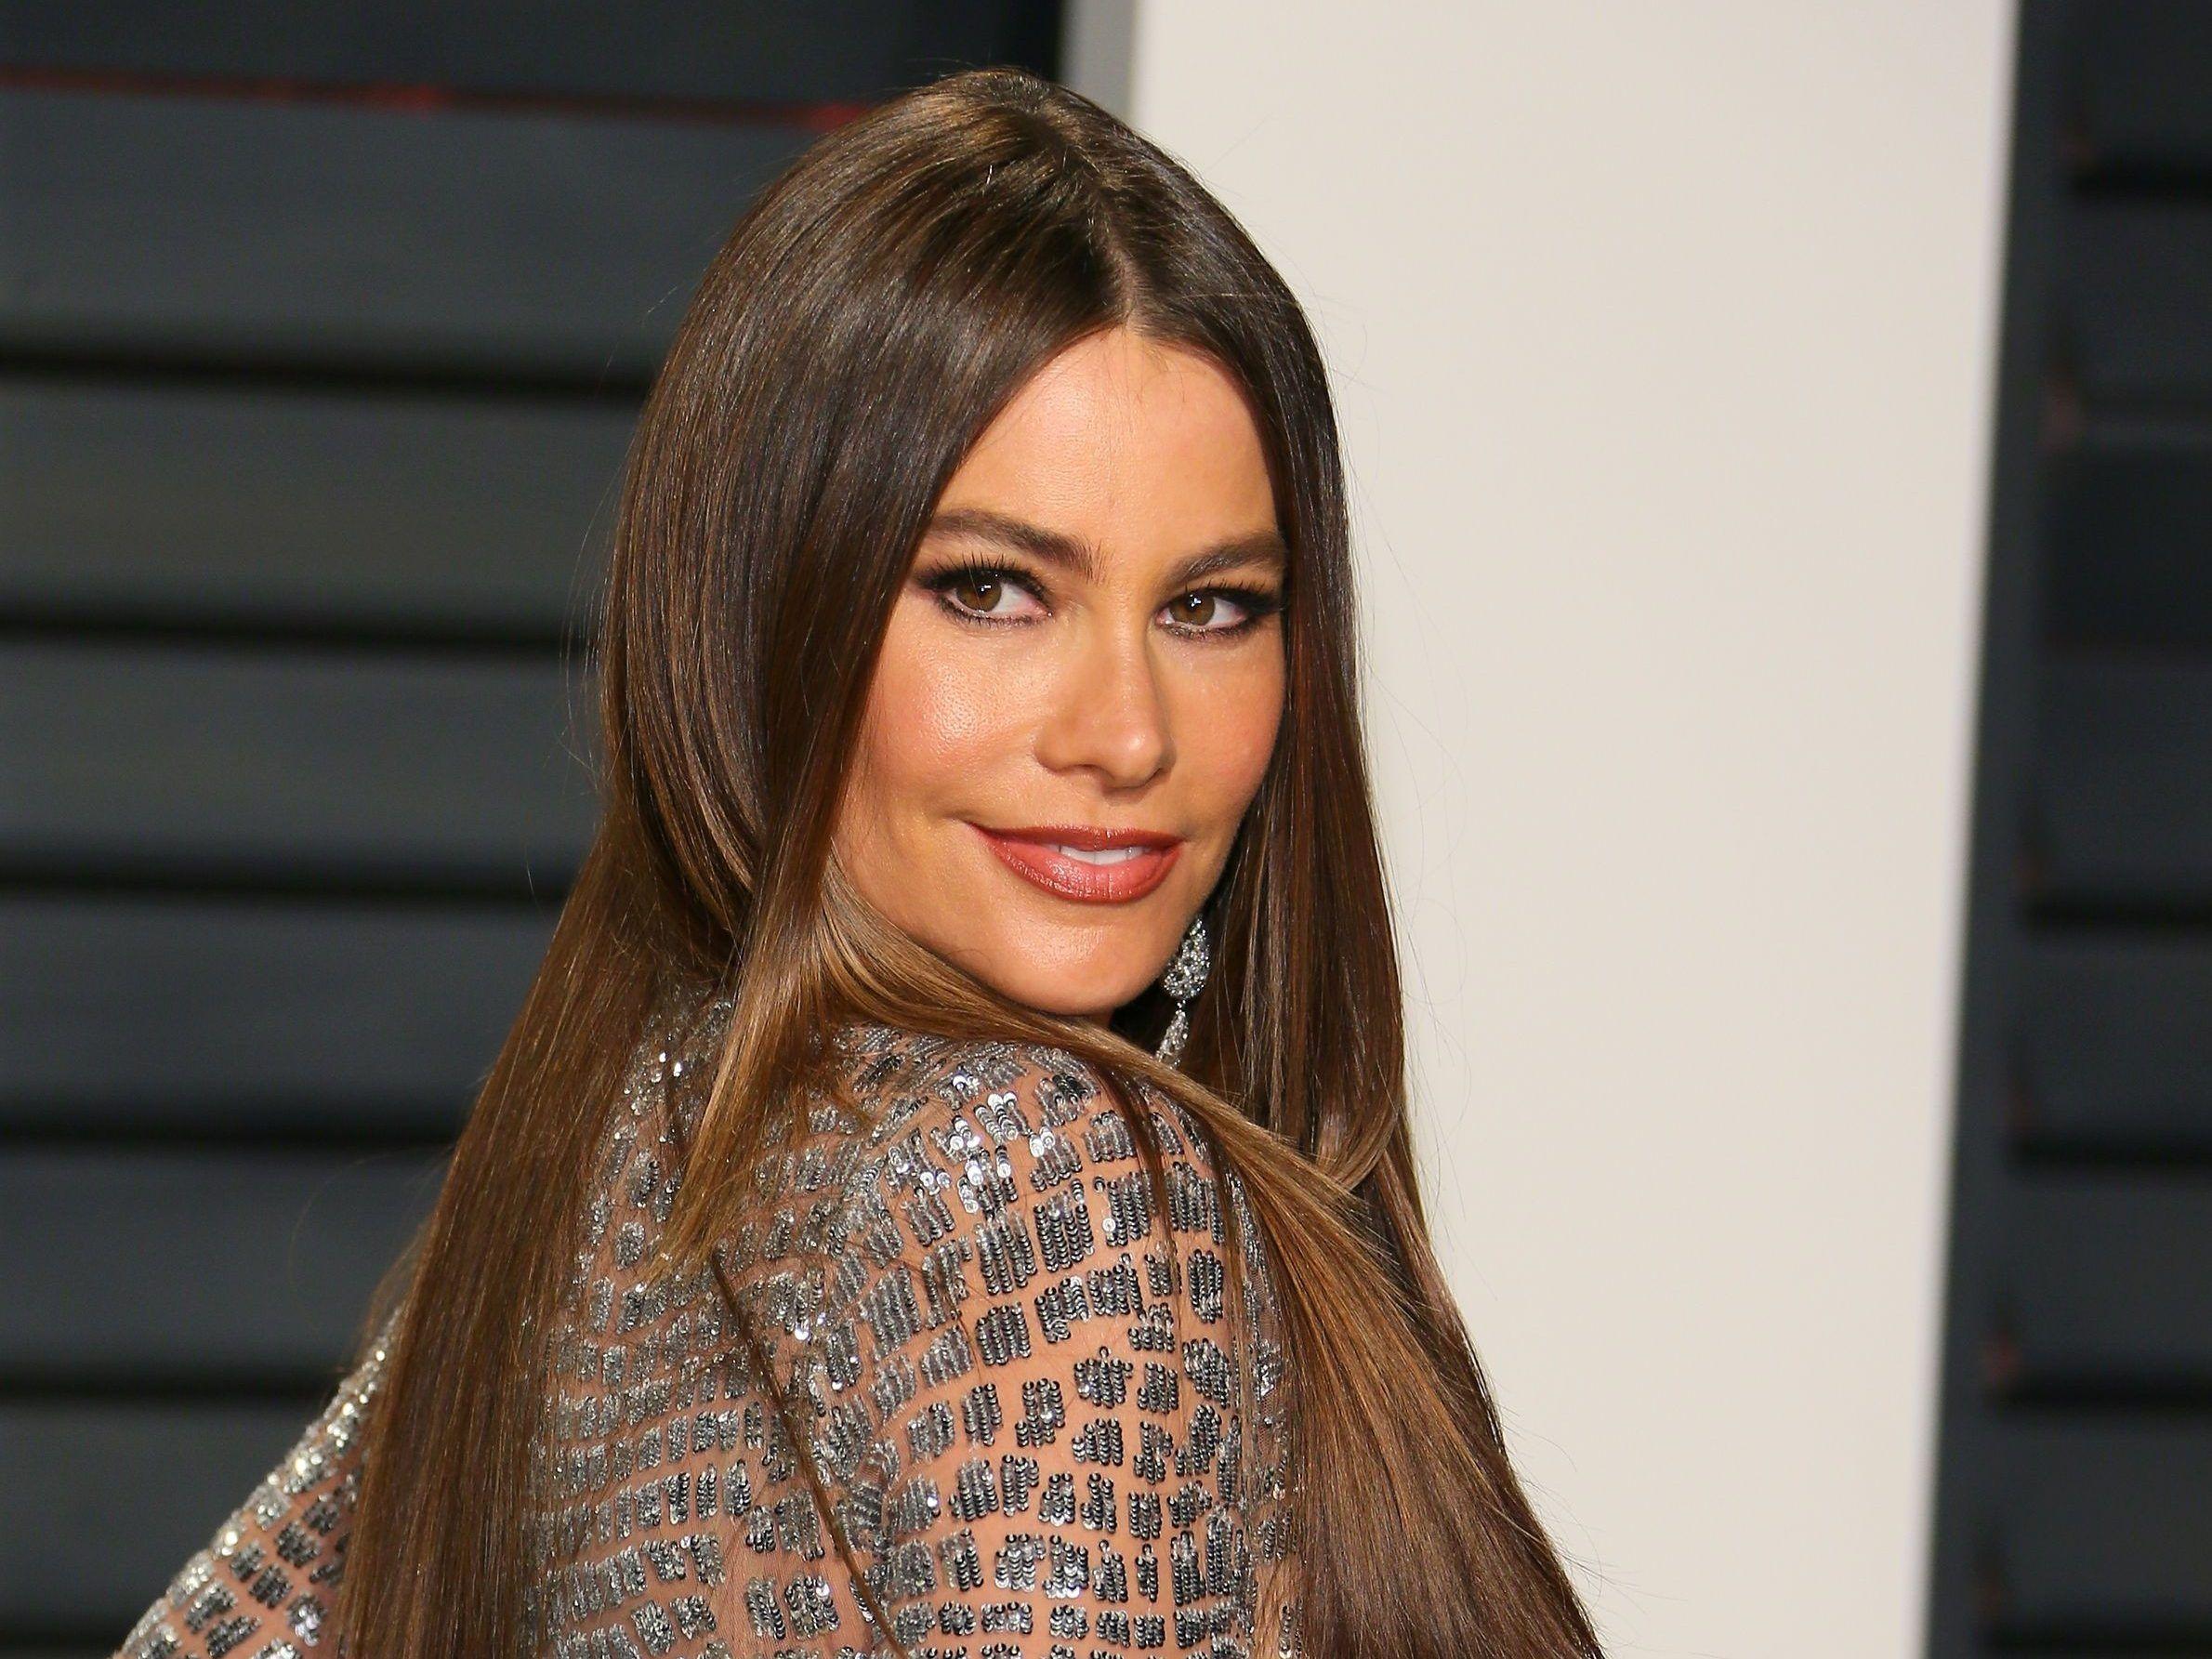 Sofia Vergara tops Forbes' highest paid actresses list